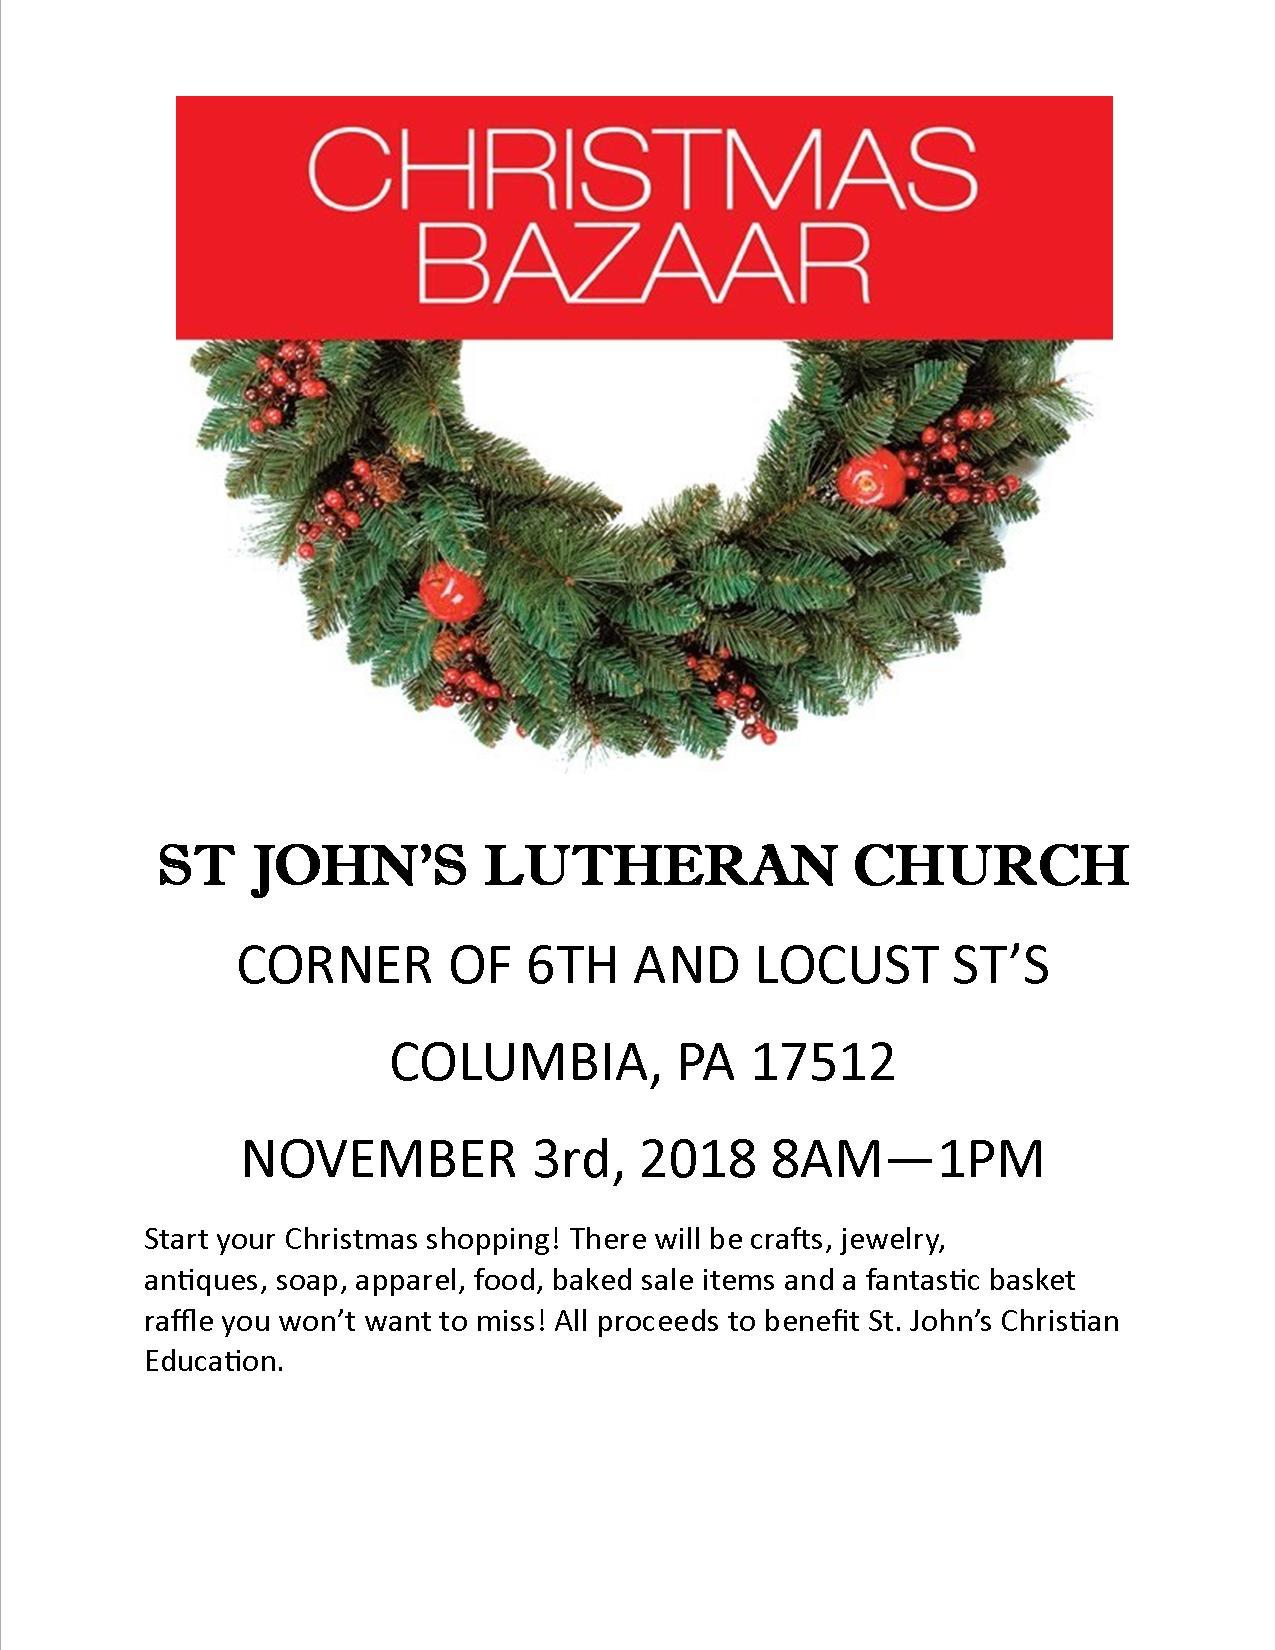 Christmas Bazaar - Lower Susquehanna Synod